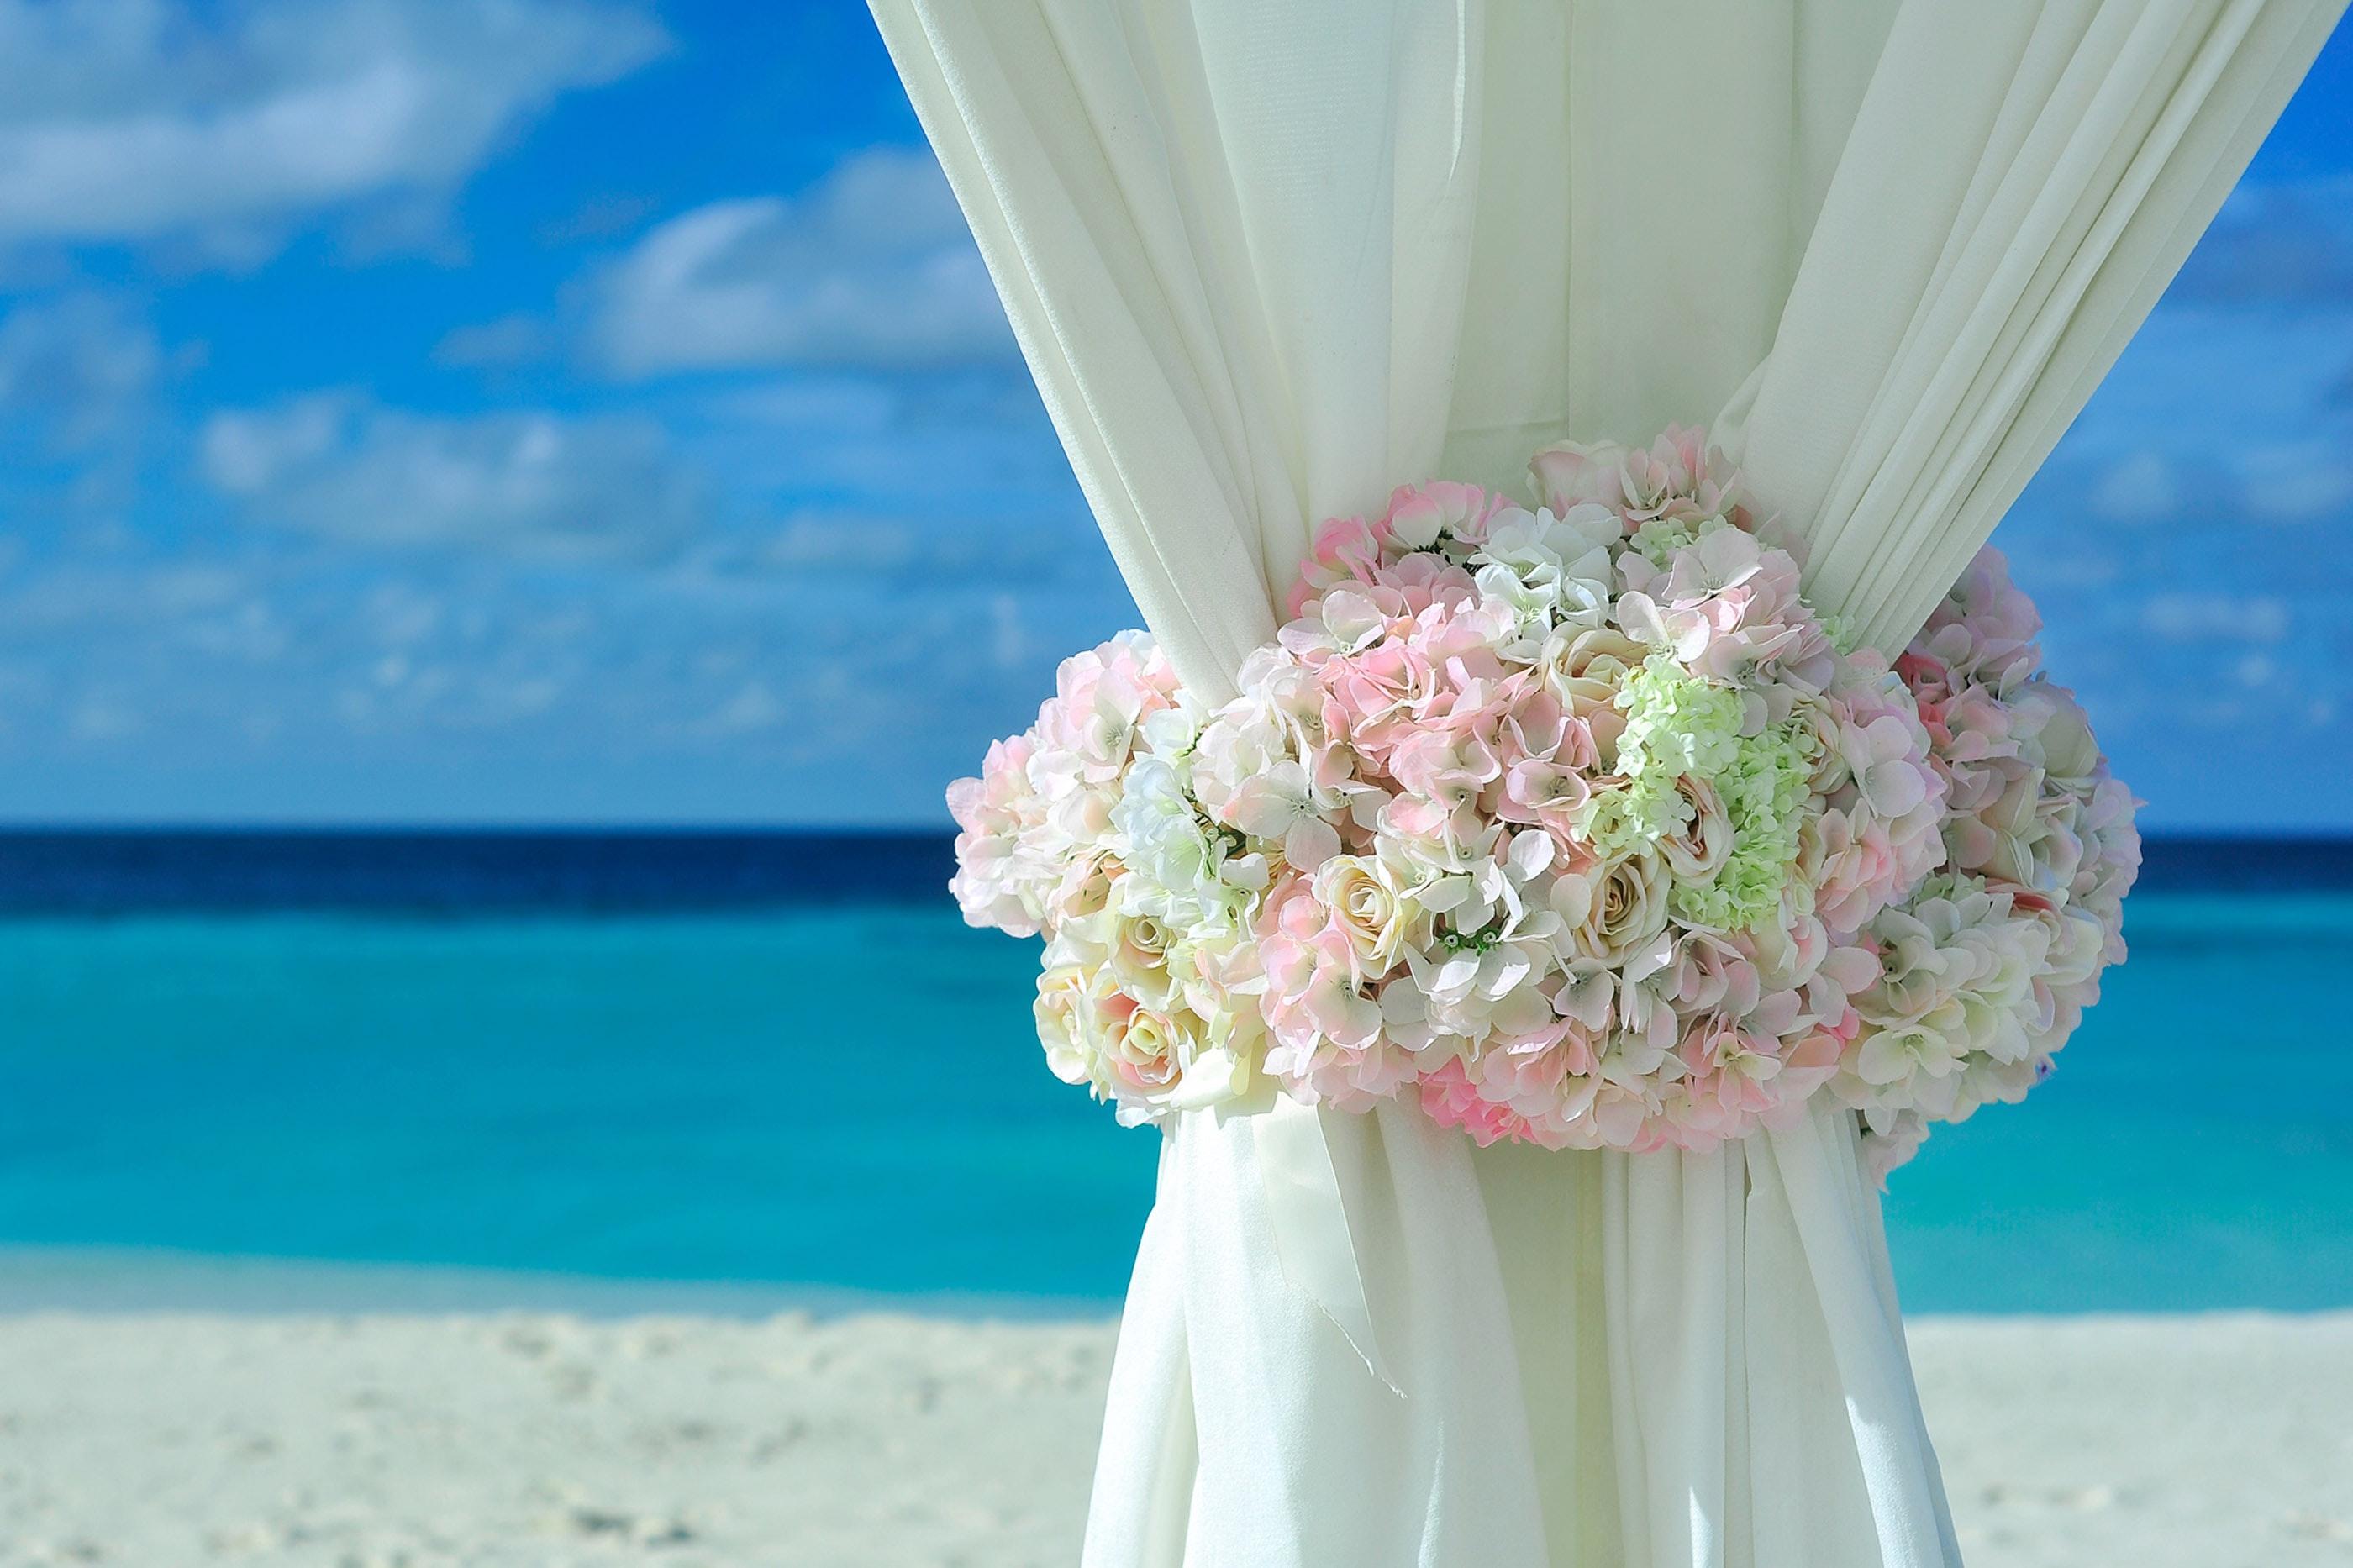 Pink white petal flower on white curtain near white sand beach on daytime photo